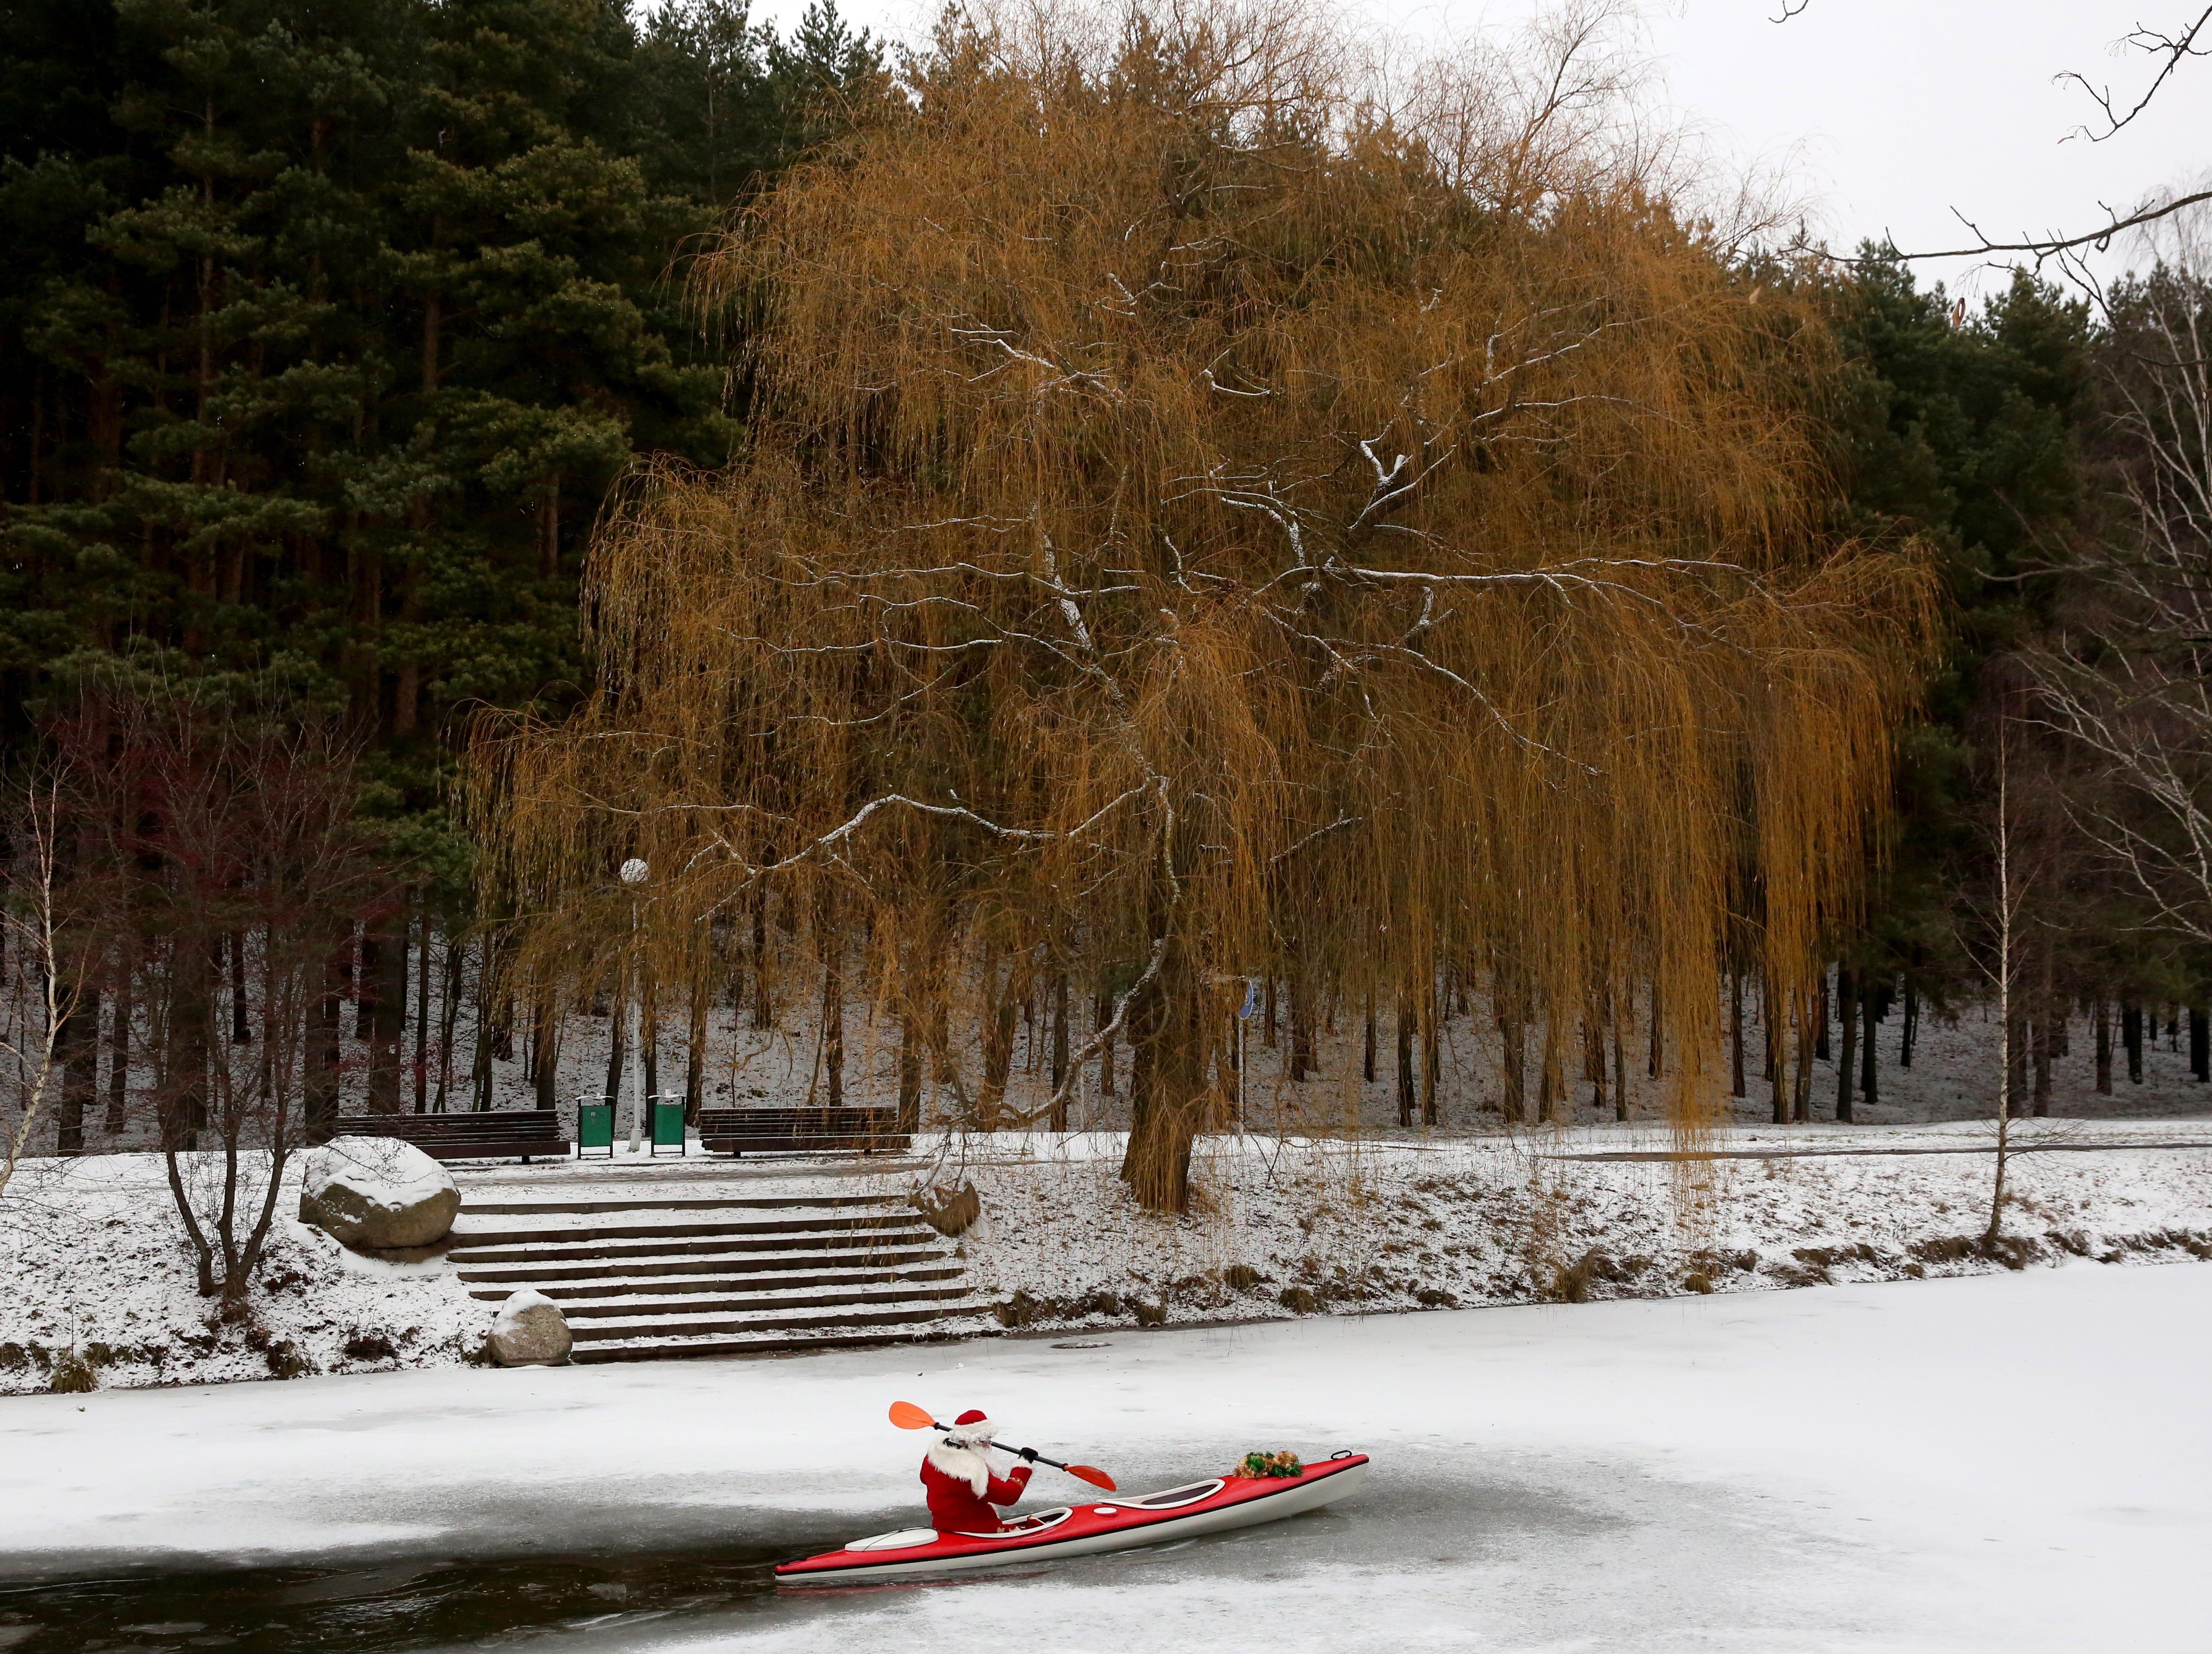 A man dressed as Santa Claus paddles a kayak in Minsk, Belarus on Dec. 15, 2018.